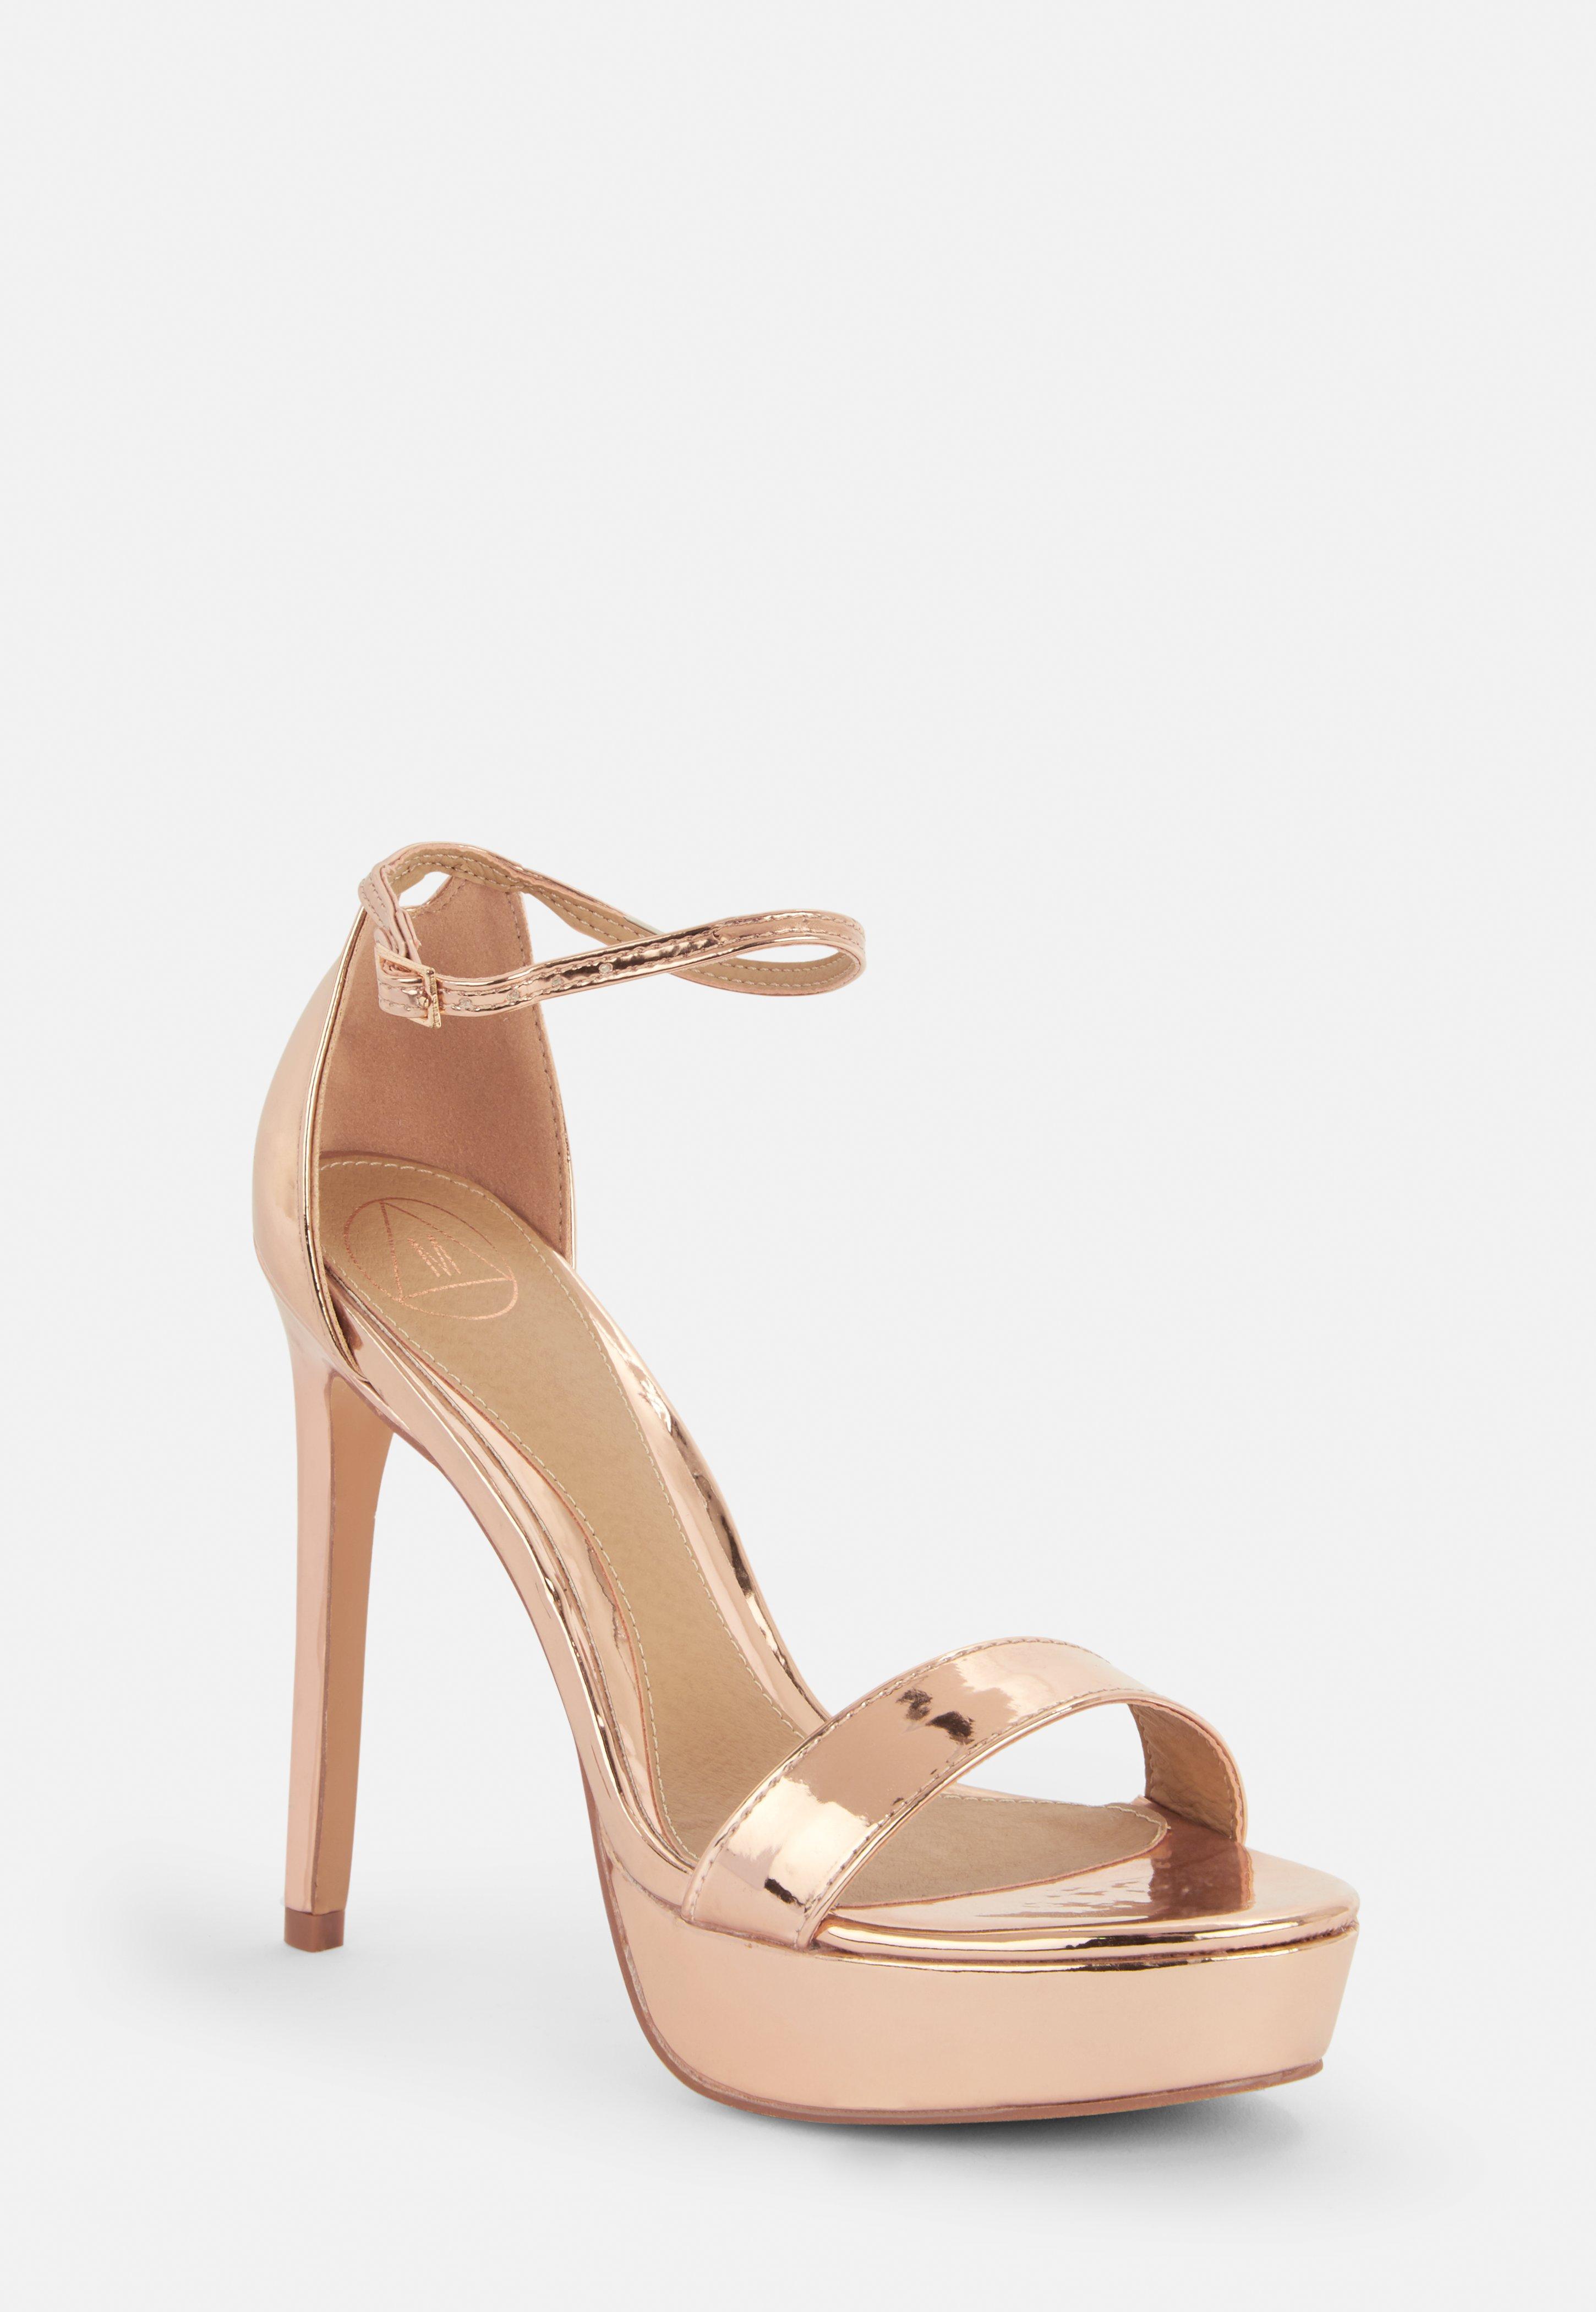 5cdcf4179f0739 Chaussure Plateforme Plateforme Sandales amp; Talons Plateformes Femme Femme